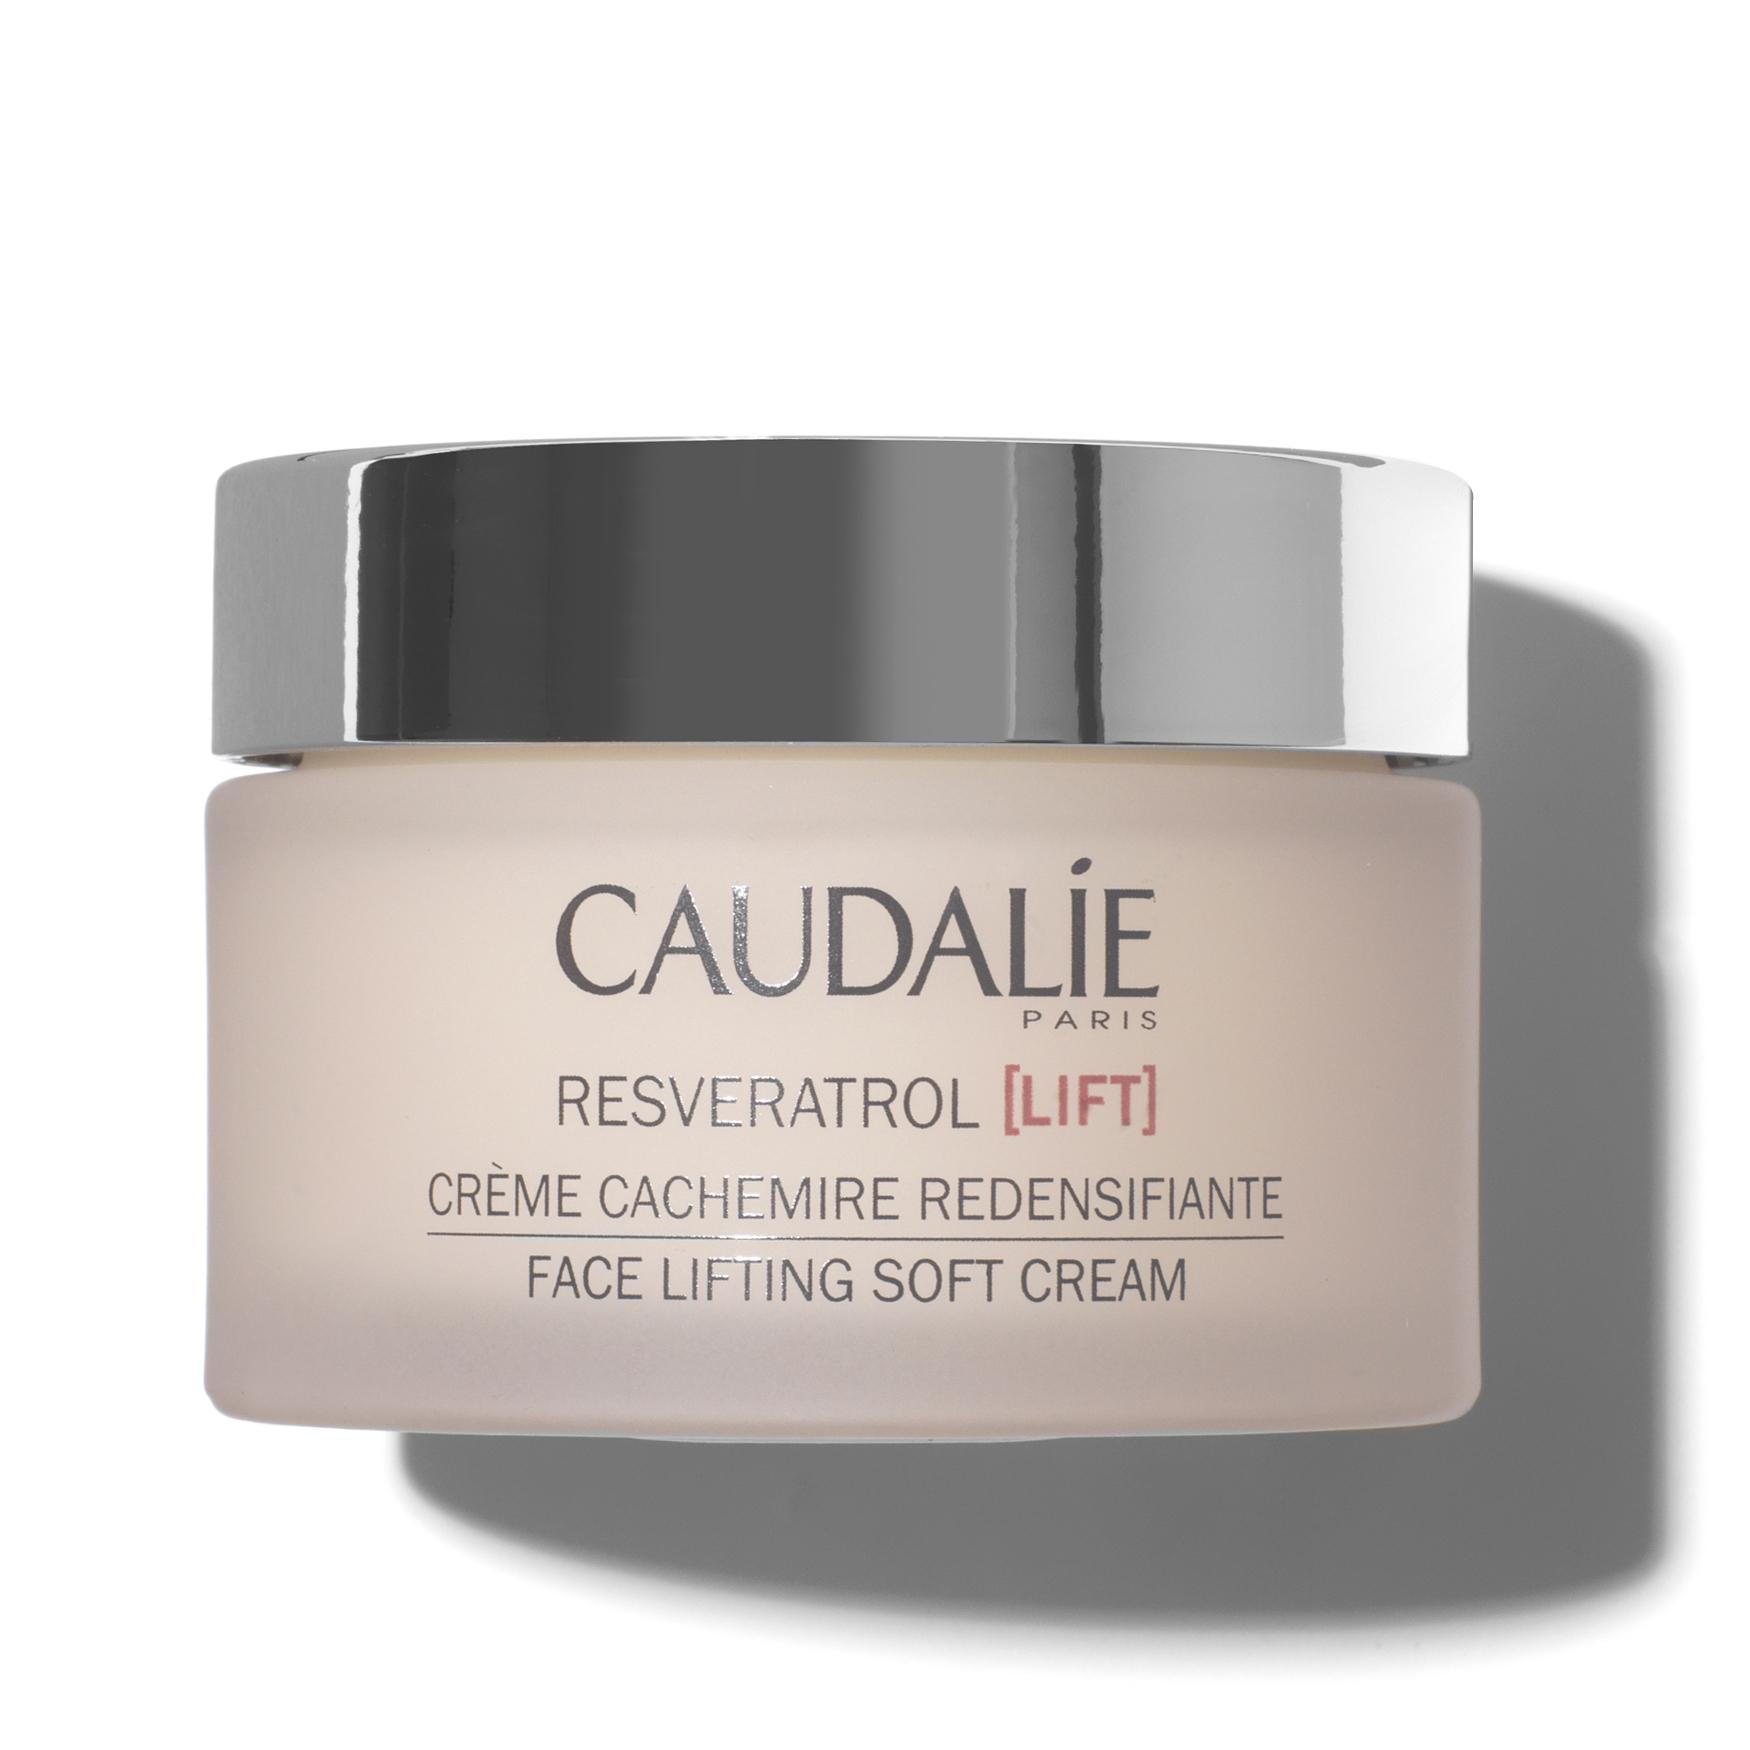 Resveratrol Face Lifting Soft Cream, , large